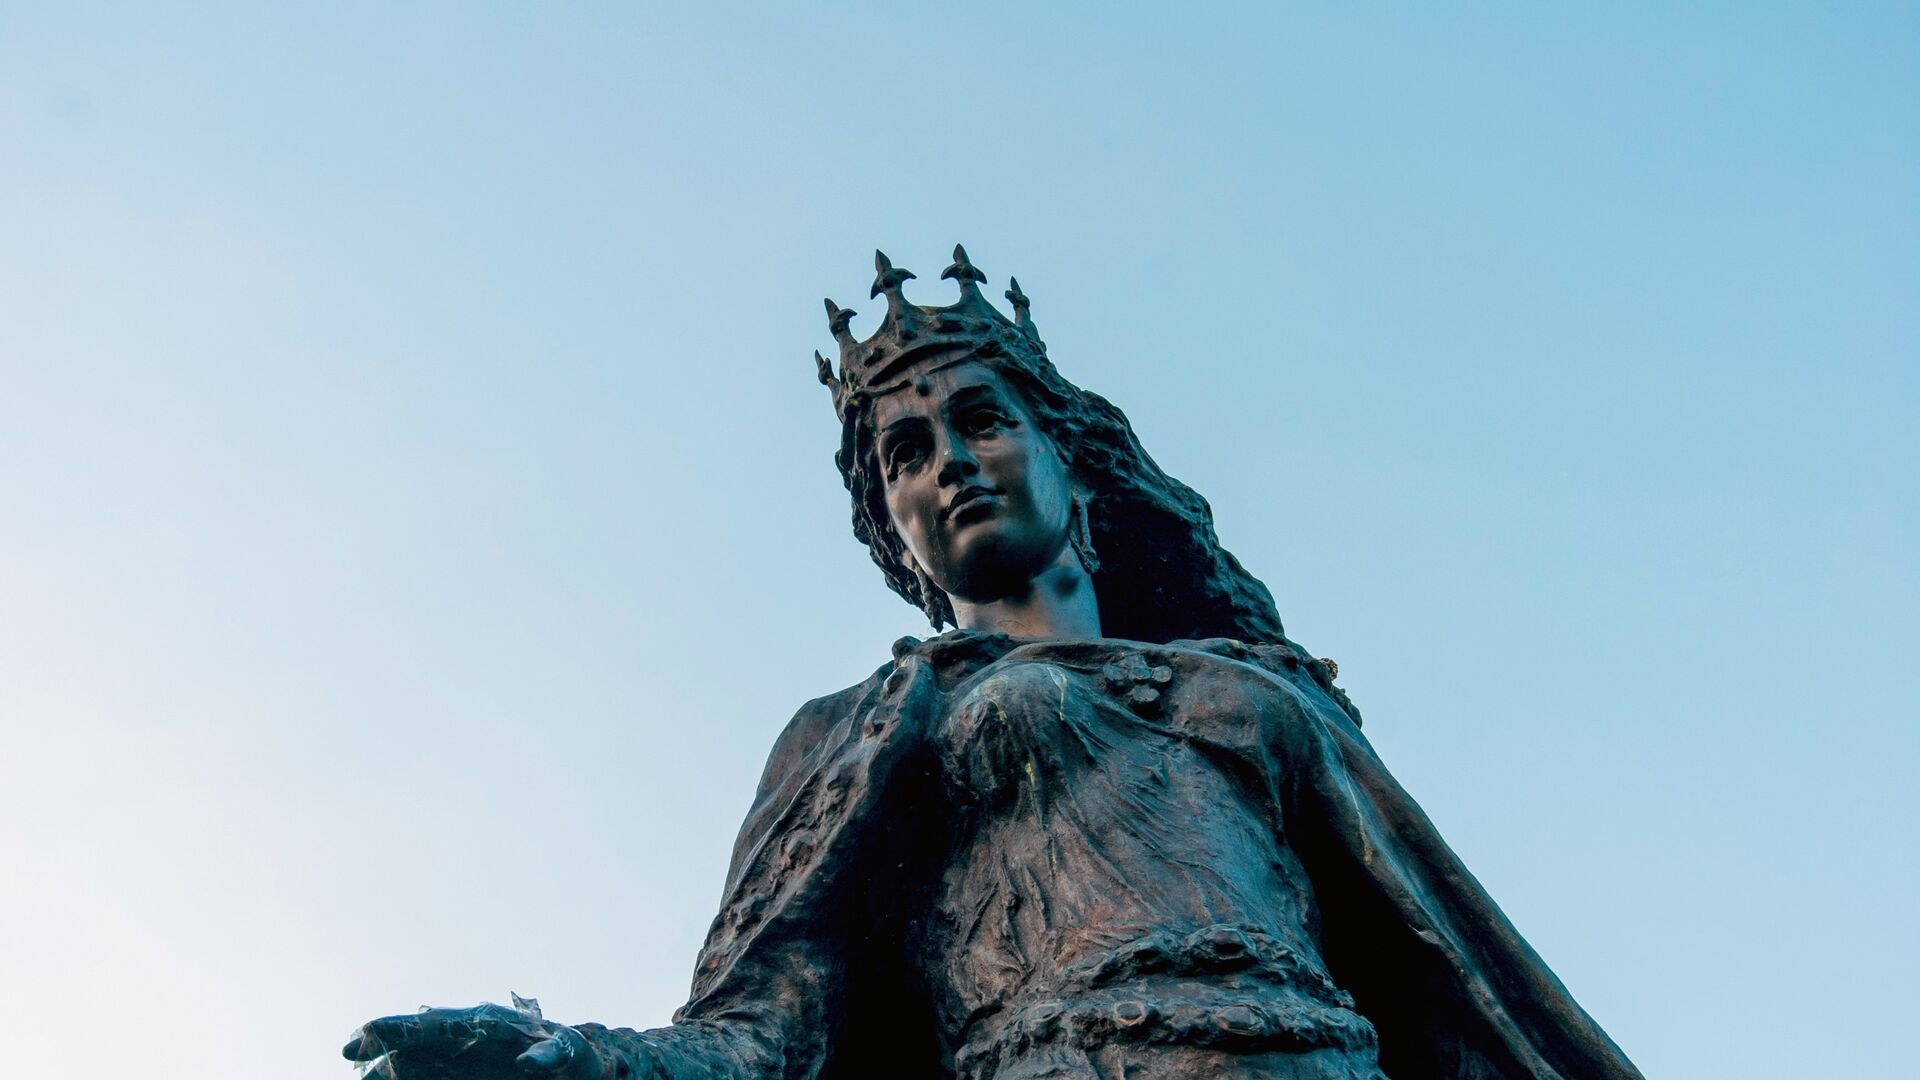 Памятник Анне Ярославне в Сенлисе, Франция - РИА Новости, 1920, 16.09.2021